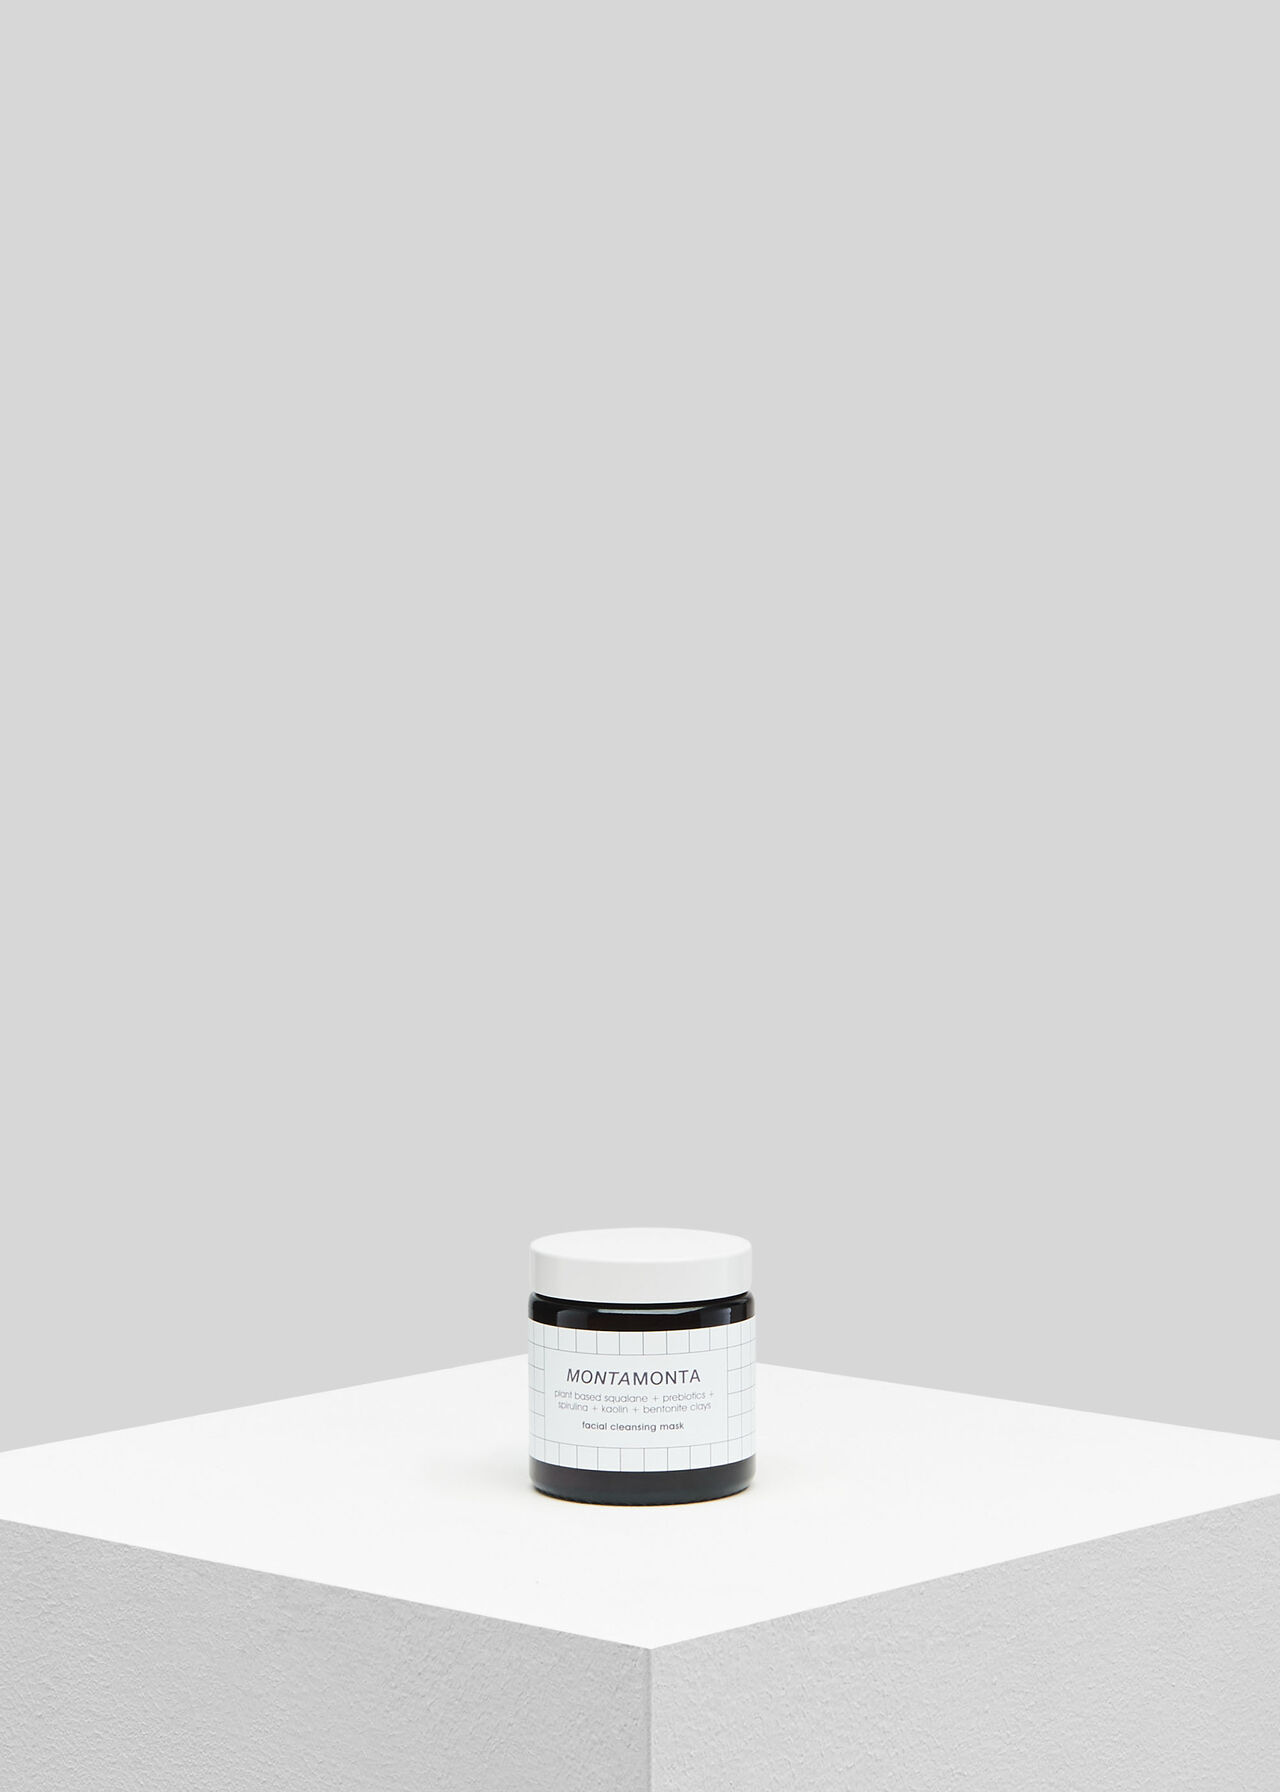 Montamonta Cleansing Mask Black and White